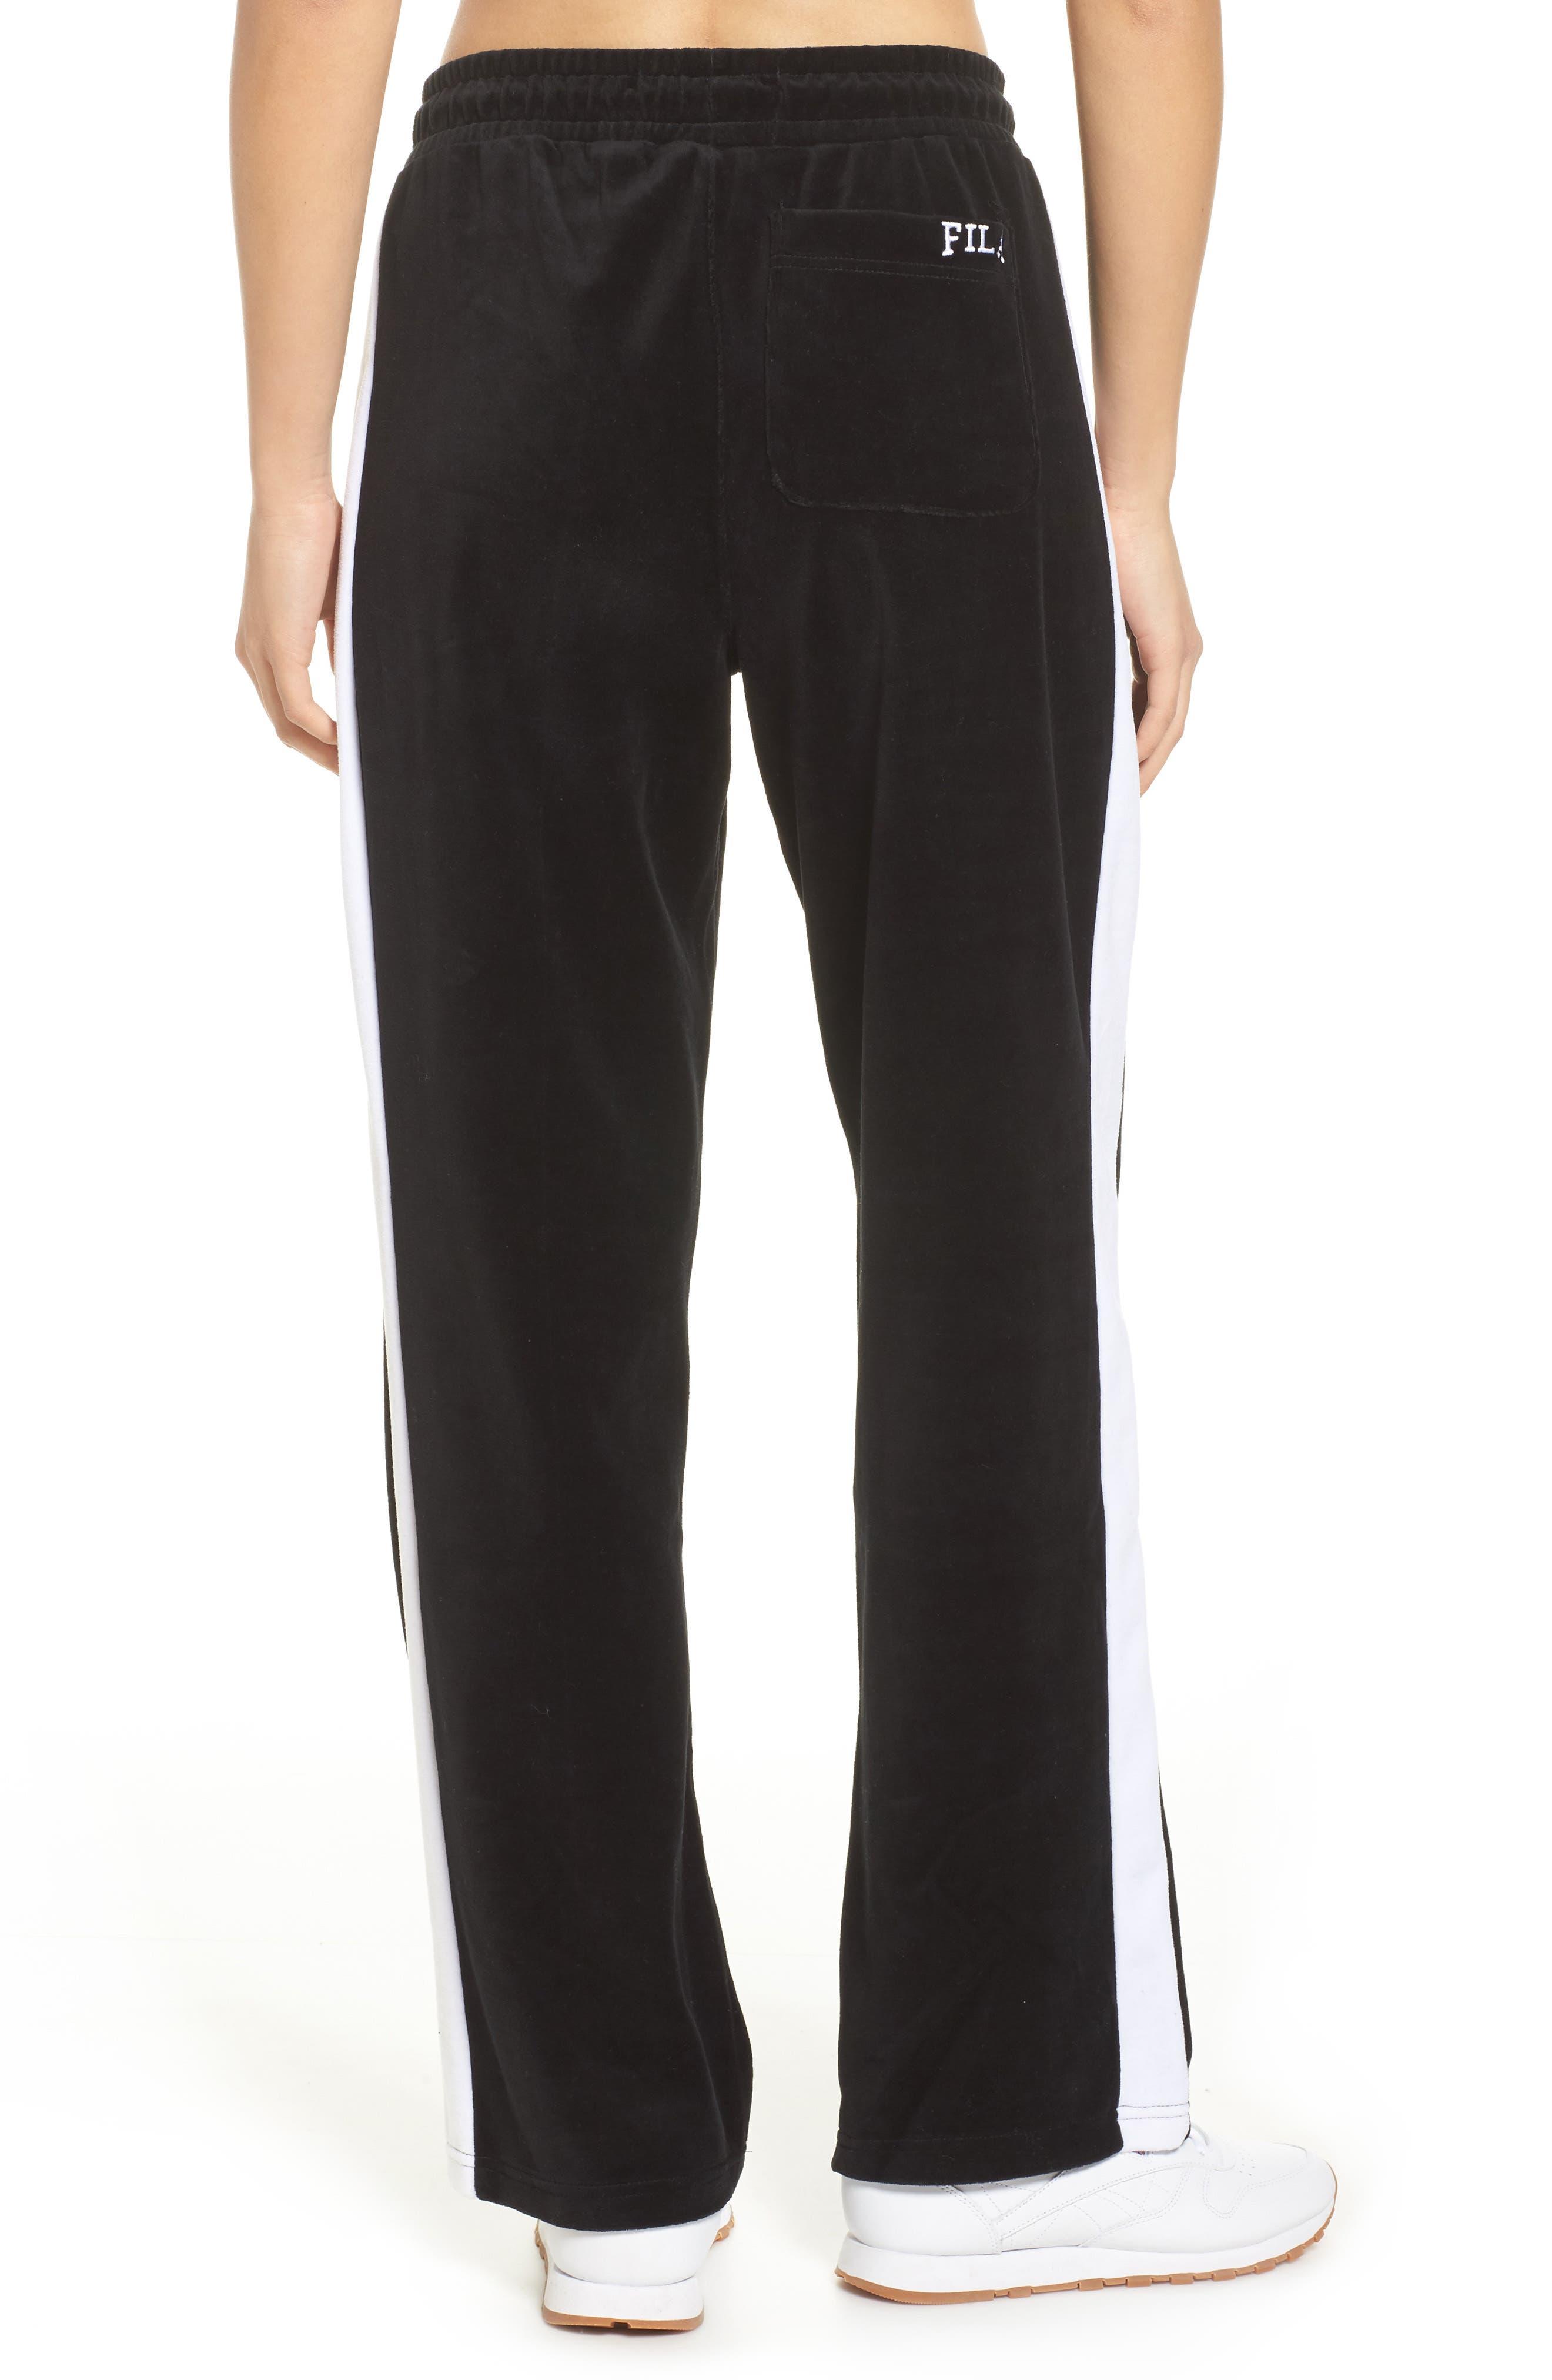 Bonnie Velour Track Pants,                             Alternate thumbnail 2, color,                             Black/ White